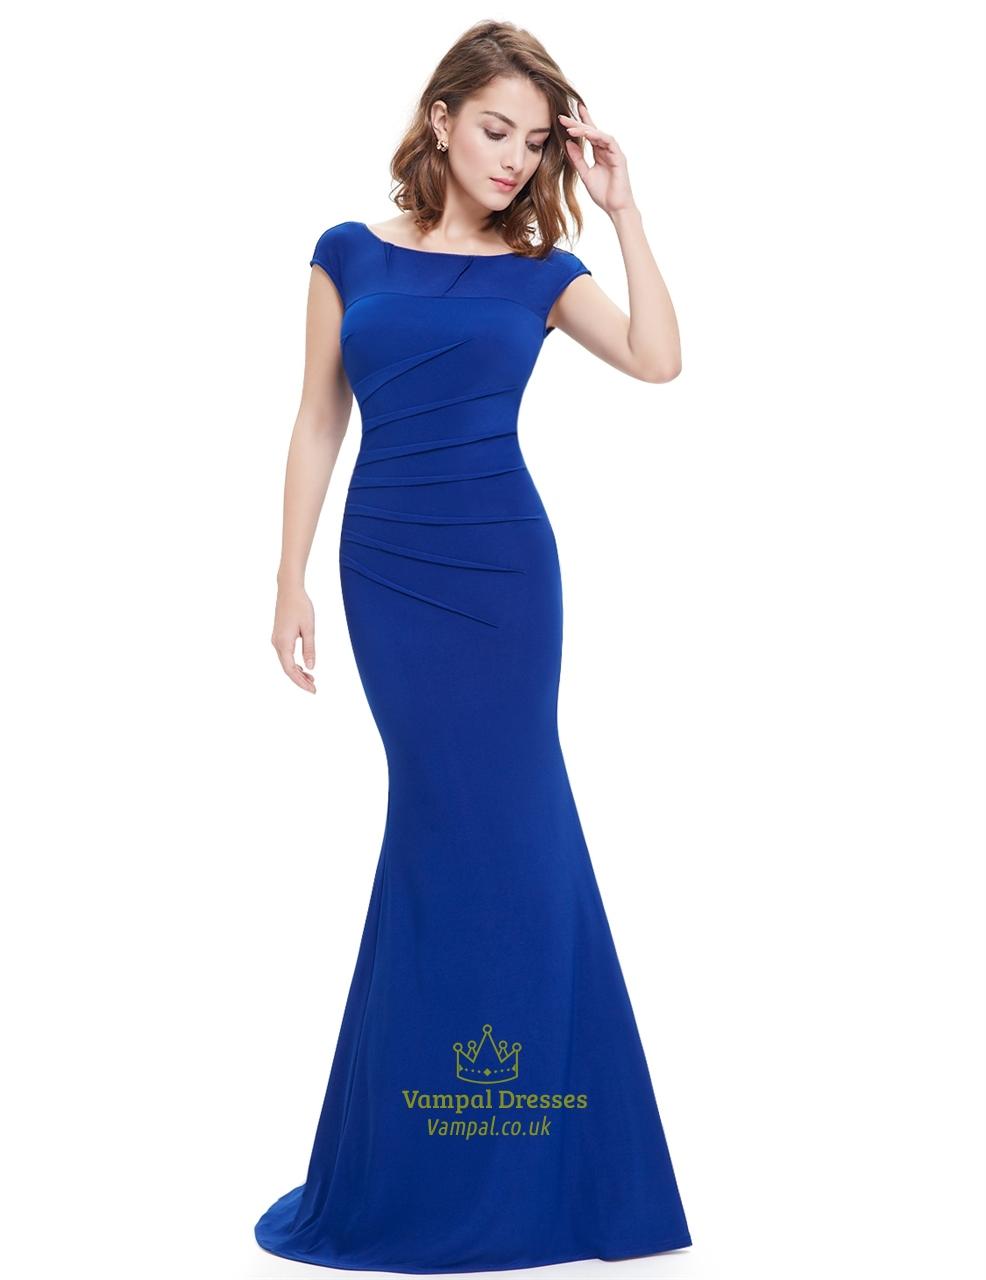 Elegant Royal Blue Cap Sleeves Mermaid Prom Dress With Open Back ...